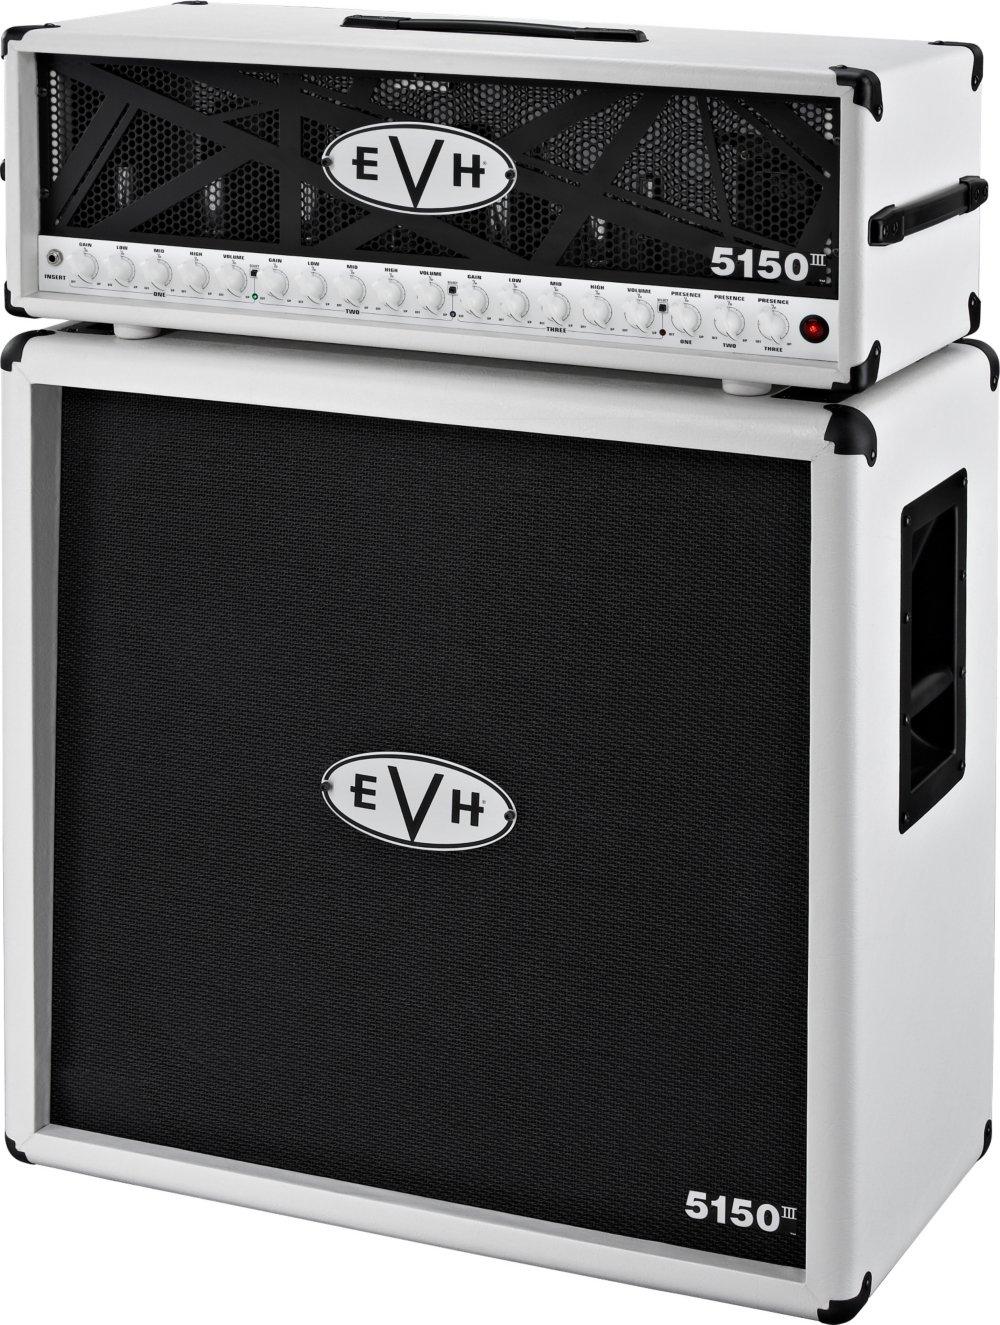 ad0a685f768 Amazon.com  EVH 5150 III 100-Watt Guitar Amp Head - Ivory  Musical  Instruments